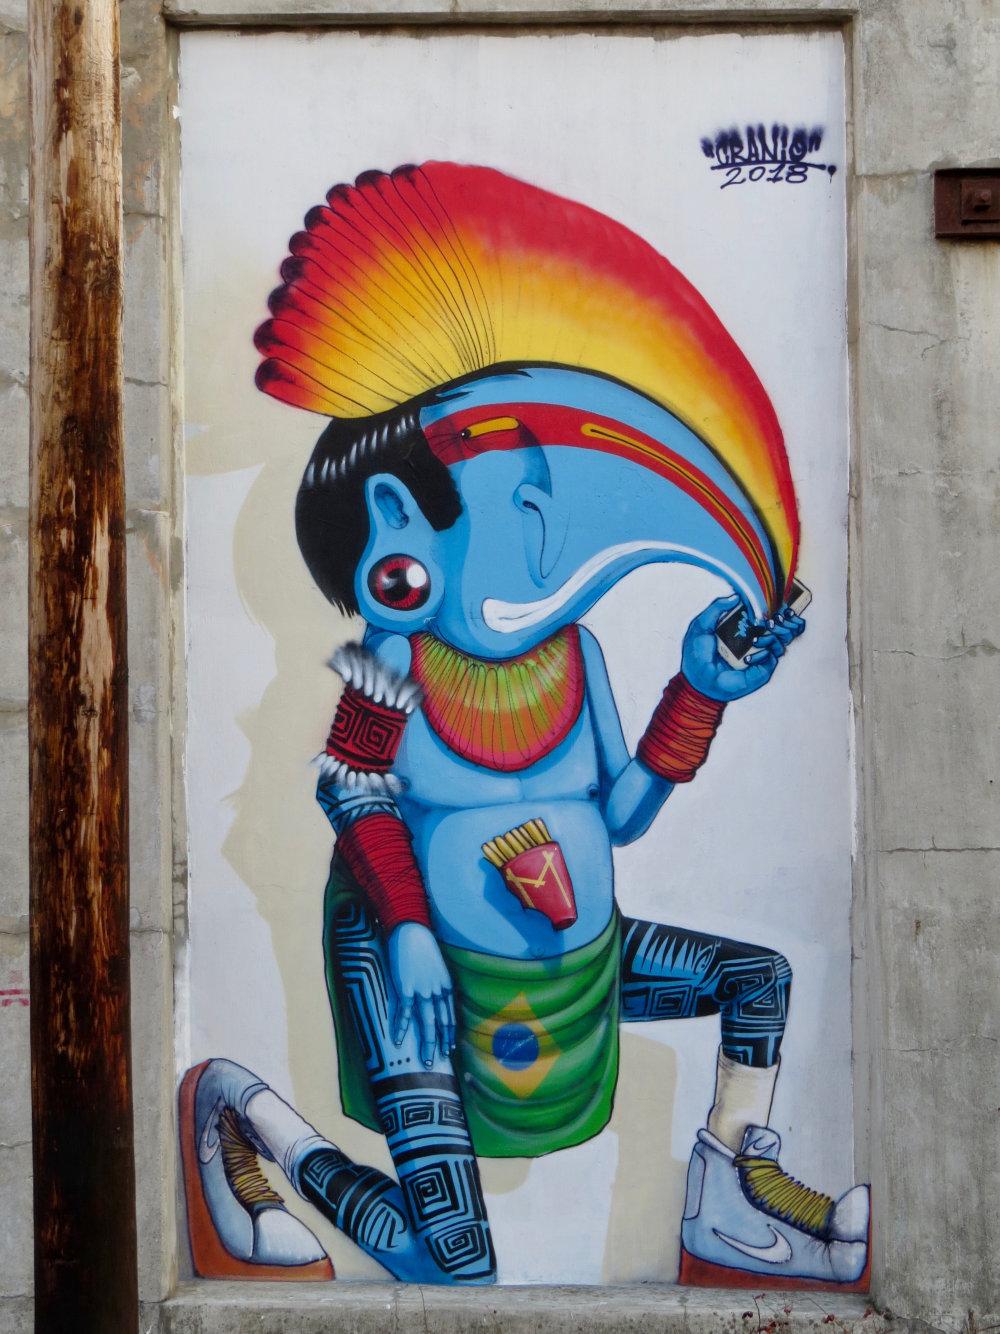 mural in Chicago by artist Cranio Artes